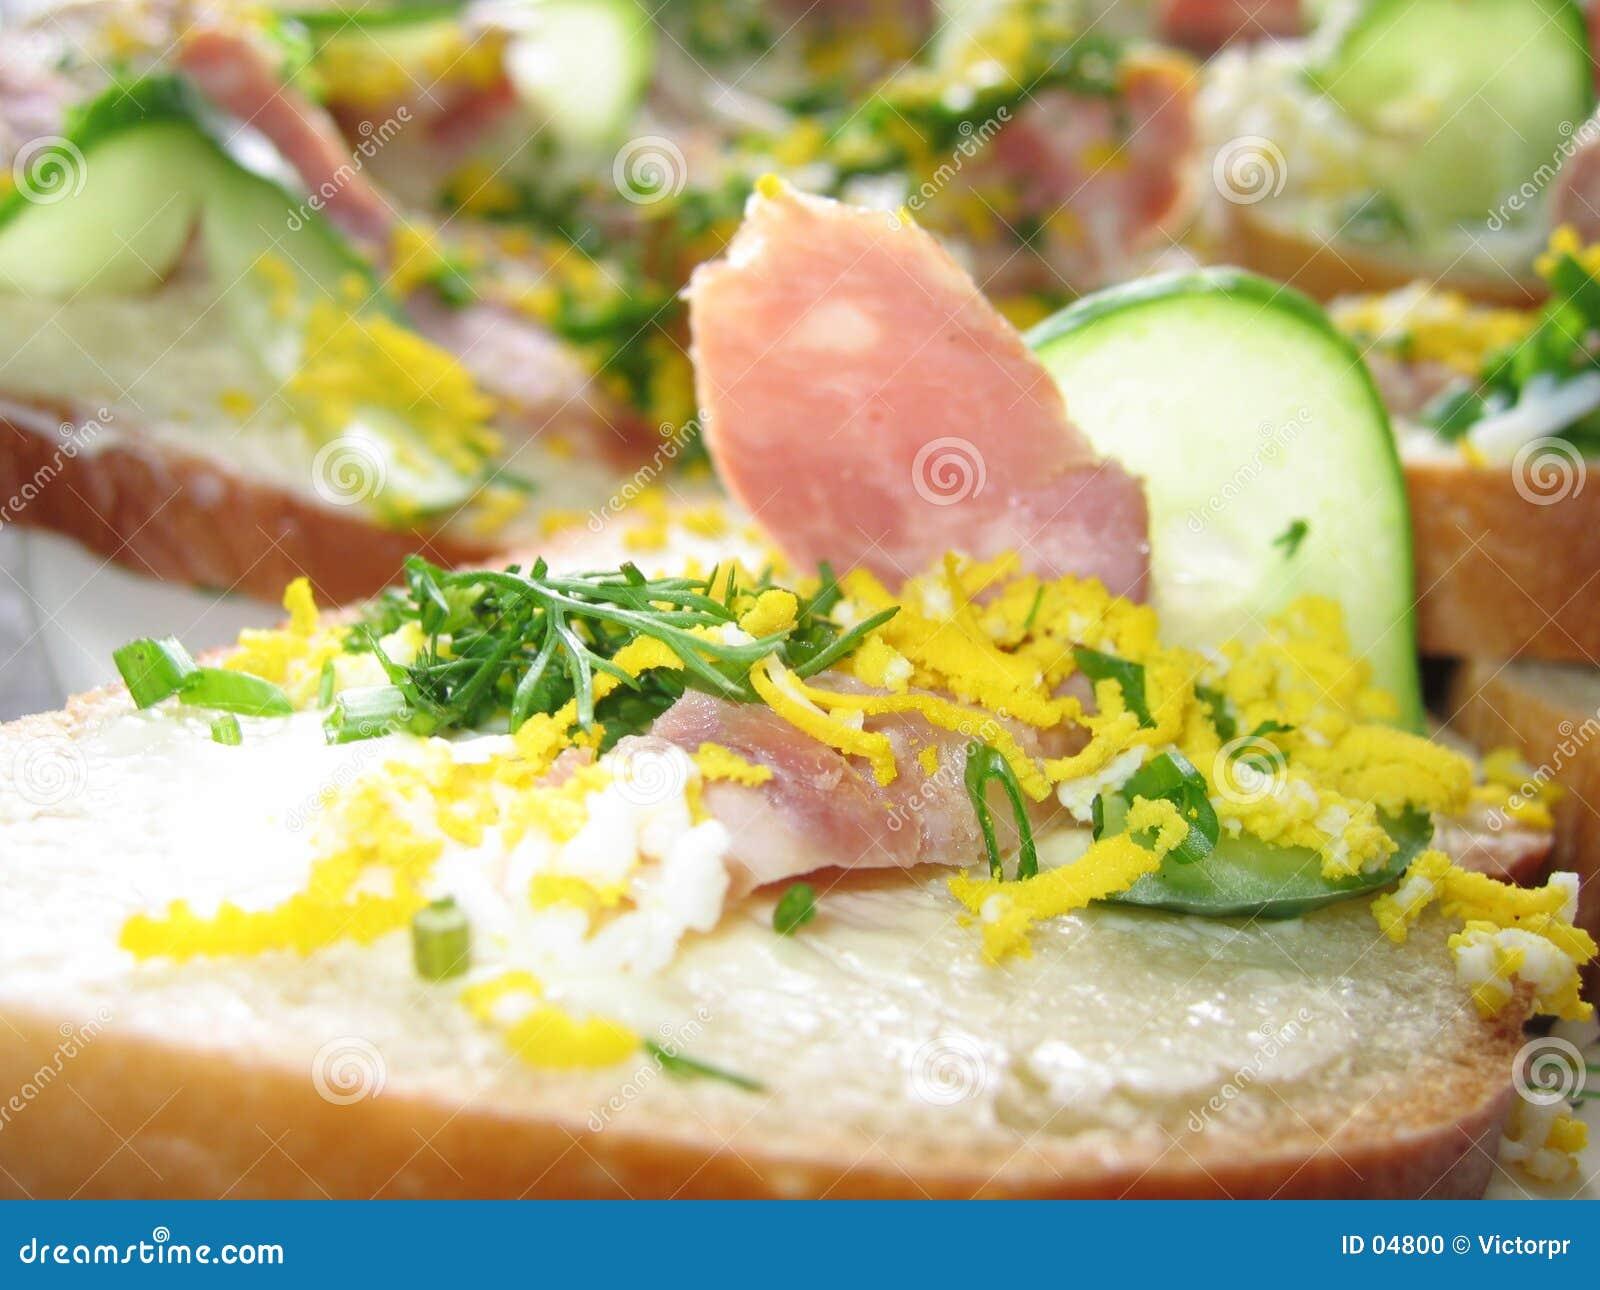 Sanduíche com presunto e pepino